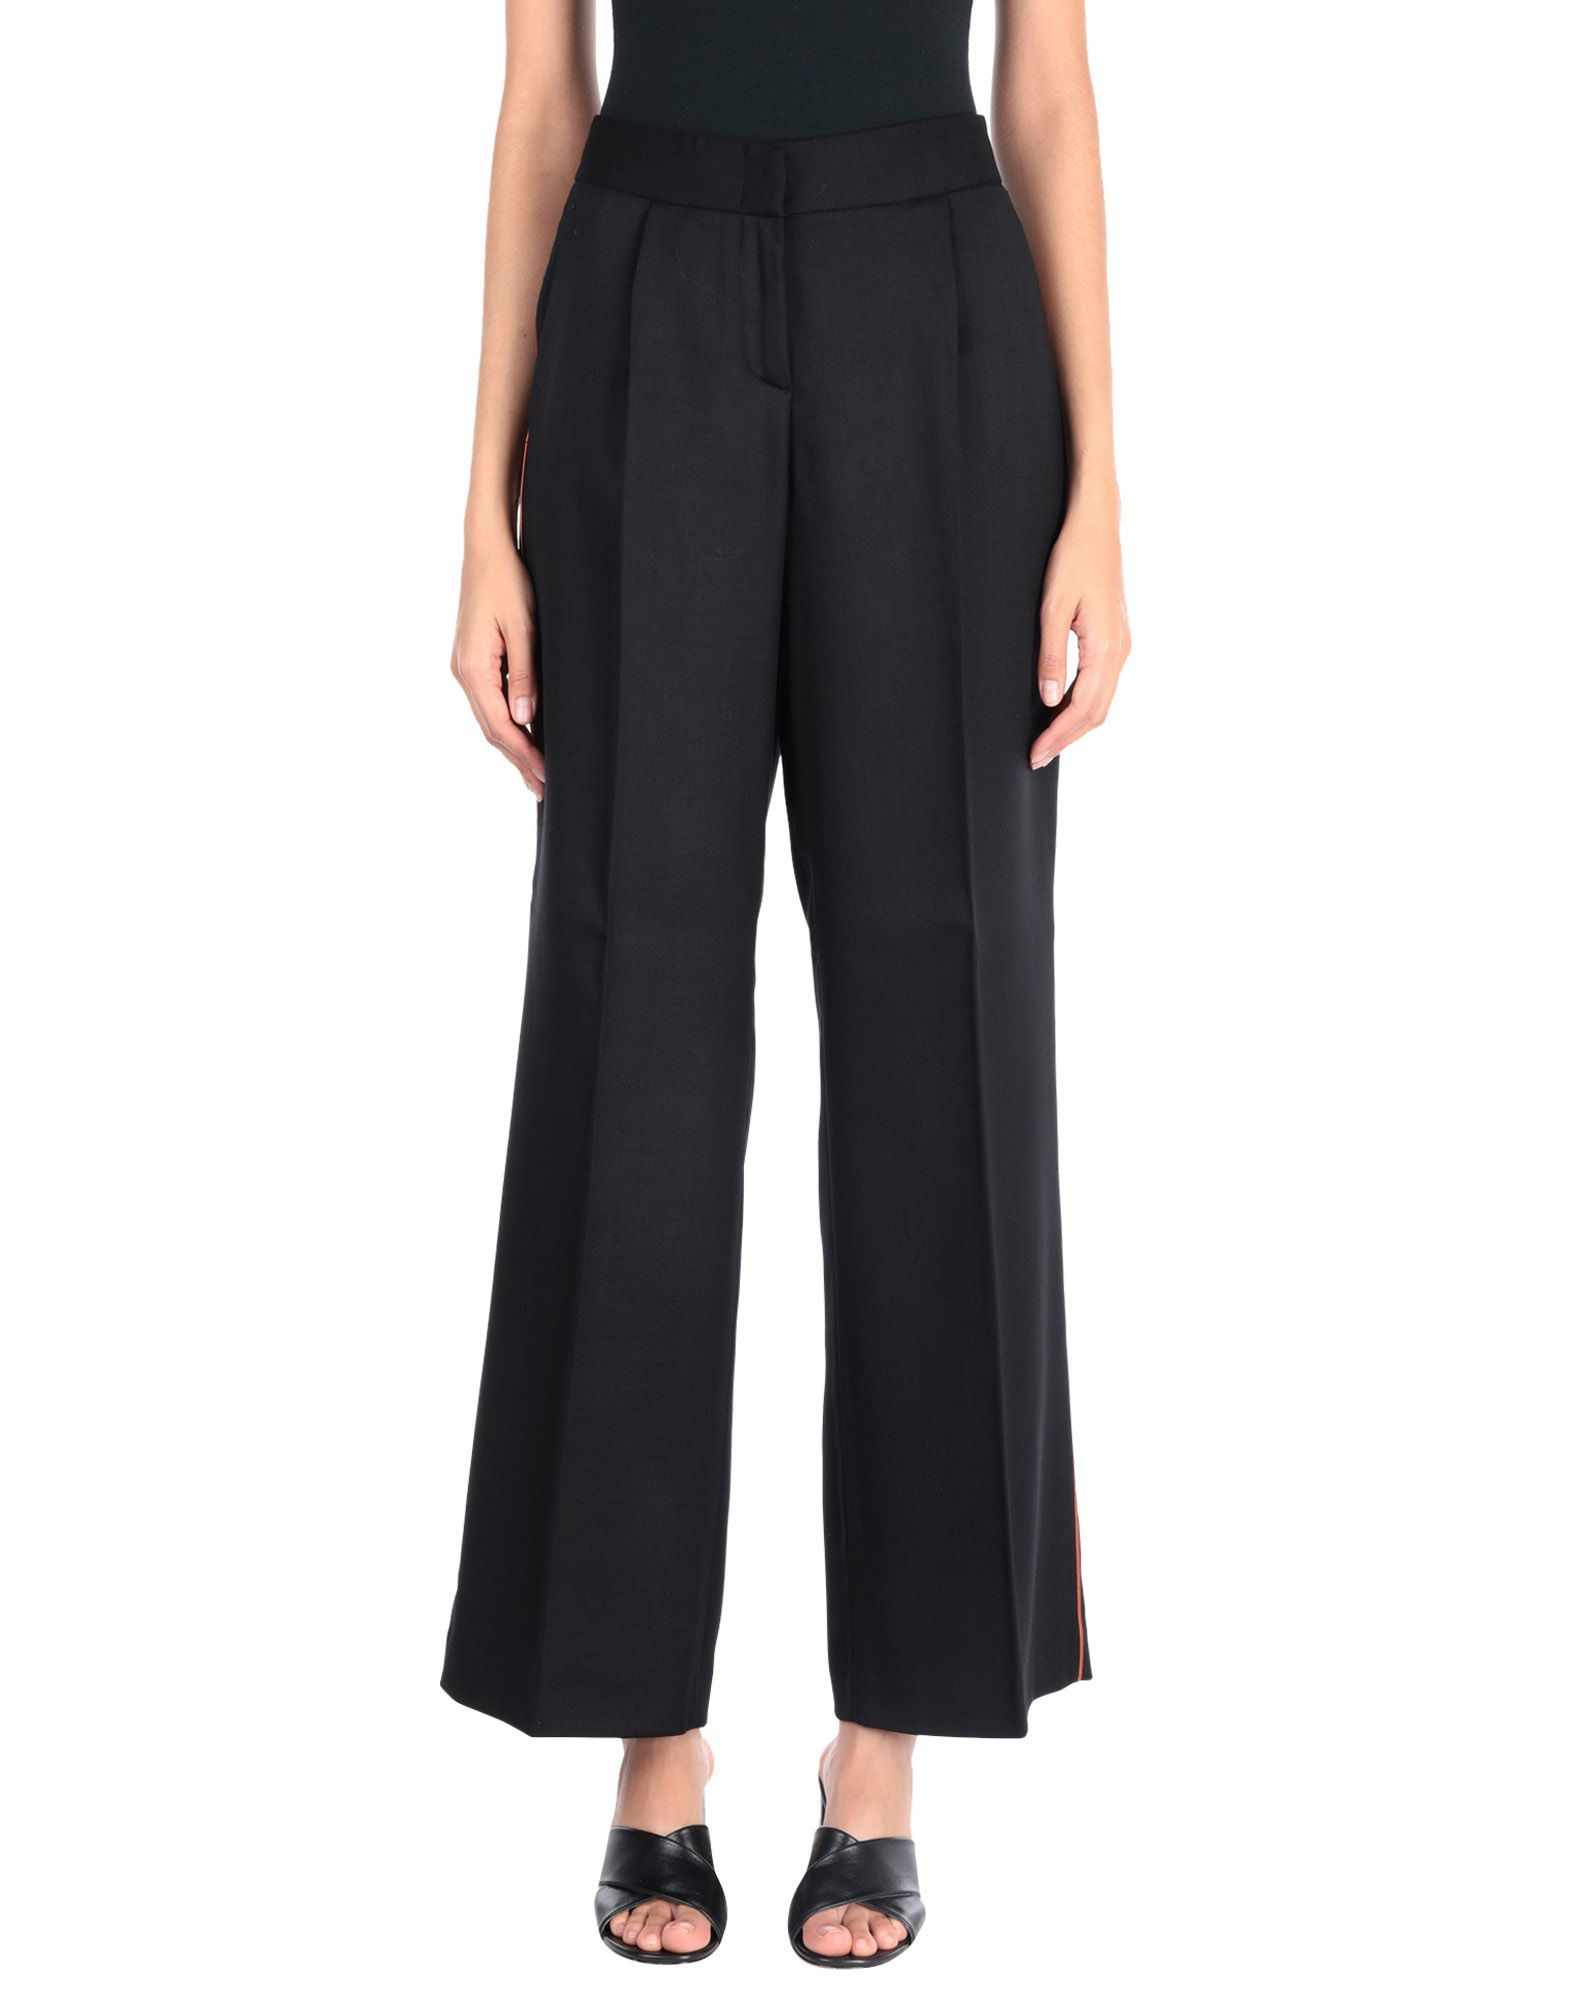 Tonello Black Virgin Wool Tailored Wide Leg Trousers